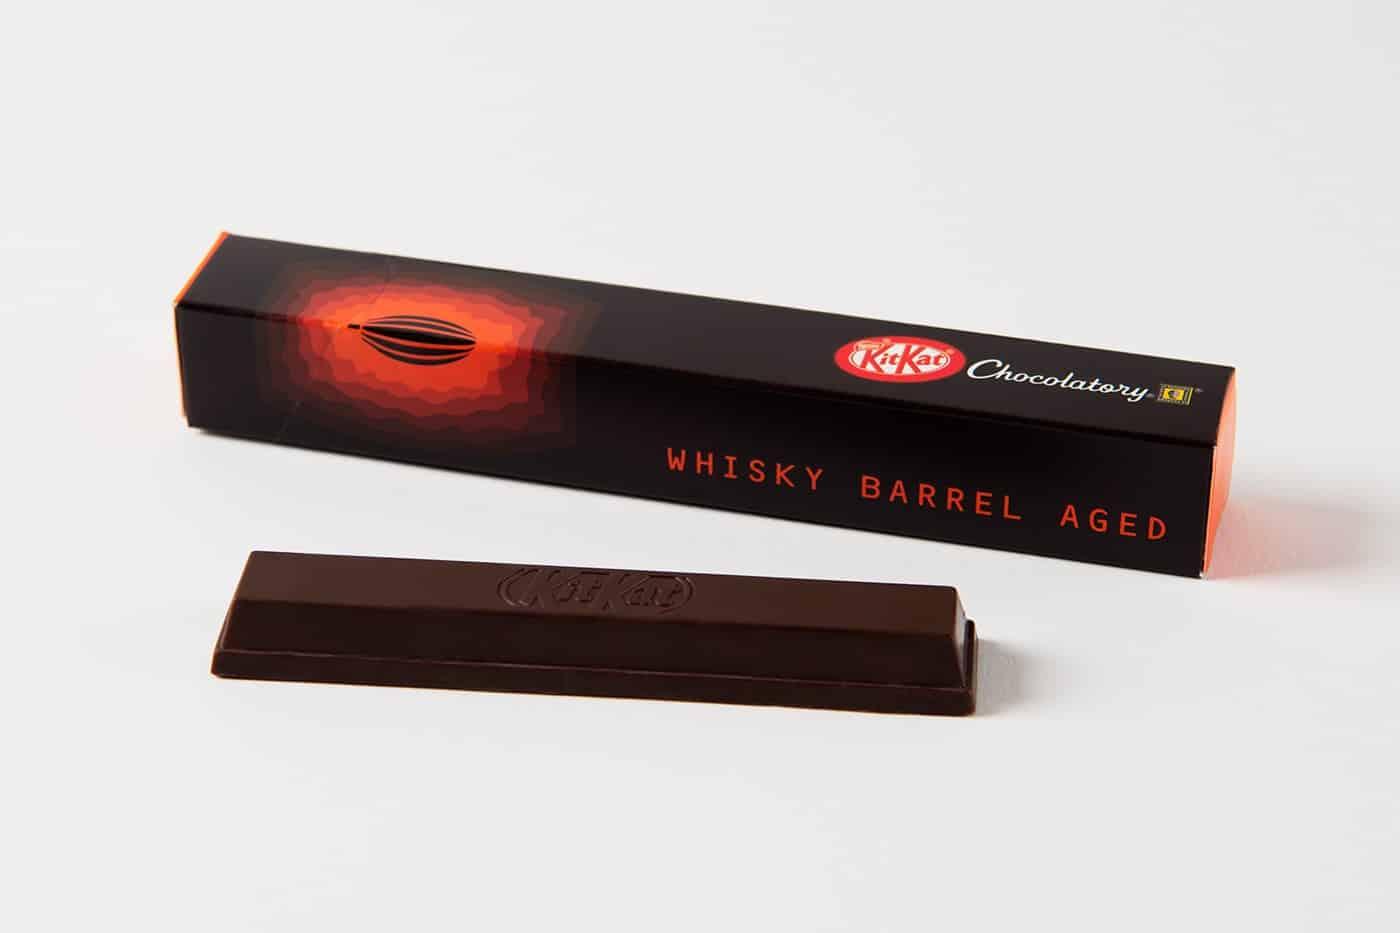 KitKat whisky barrel aged